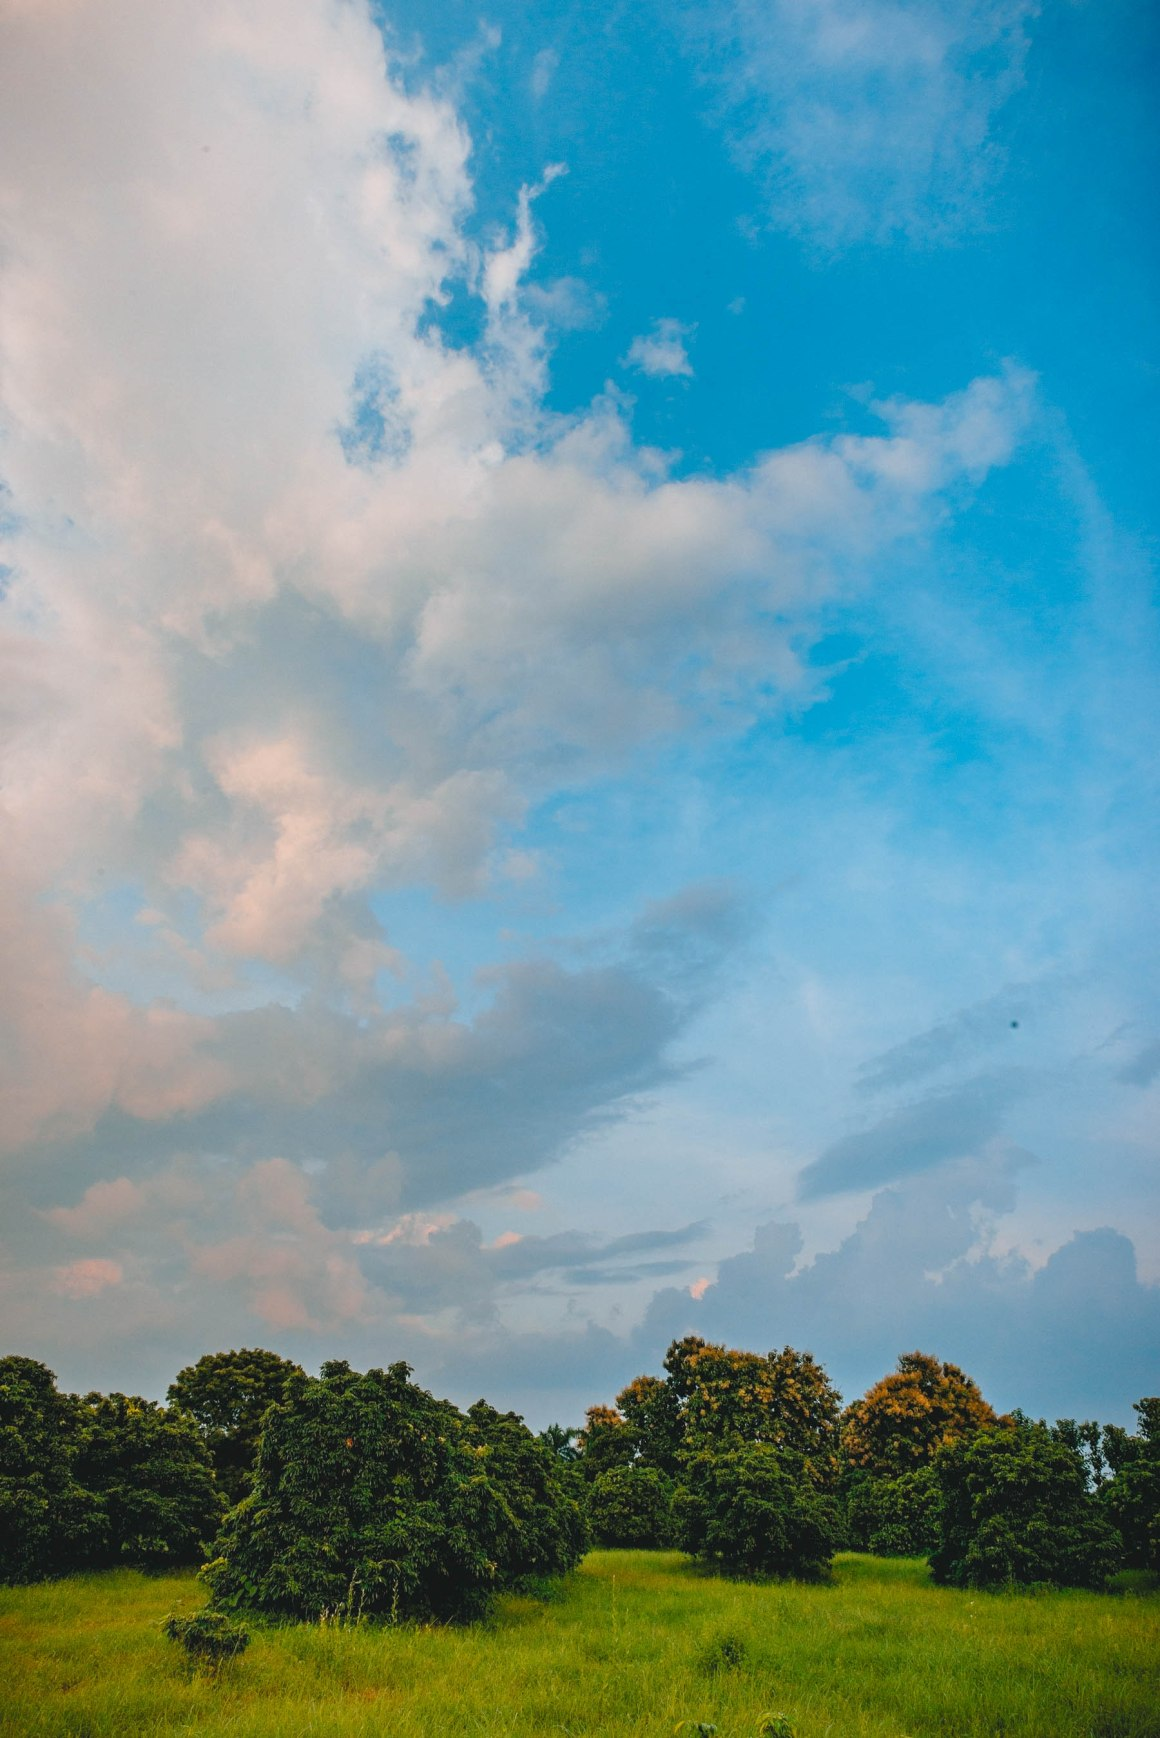 Ranikhet, Uttarakhand, EyesForDestinations, EyesForIndia, EyesForRanikhet, EyesForUttarakhand, NainaxRanikhet, Travel Photographer, Destination Photographer, Travel Photography, Destination Photography, Resort, Hospitality, Lifestyle, Travel Blogger, Lifestyle Blogger, Vacation, Road Trip, India, Professional Photographer, Luxury, Lifestyle, Blogger, Feature, Story, Landscape Photographs, Landscape Photographer India, Landscape Photographer